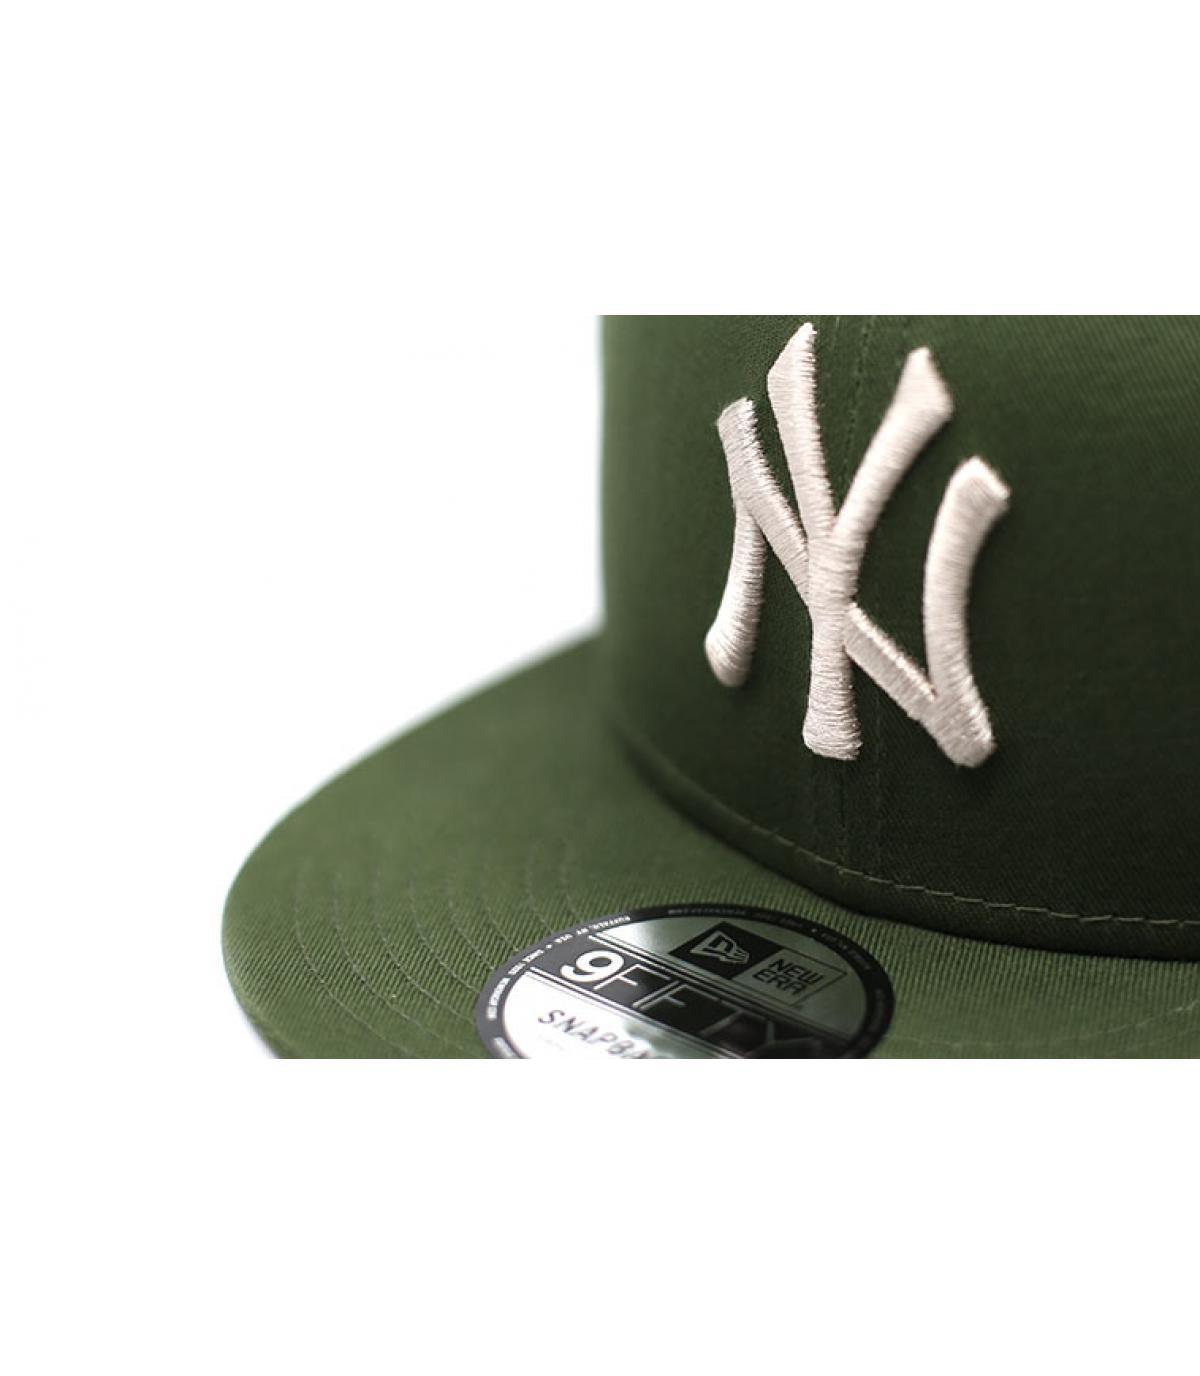 Dettagli League Ess 9Fifty NY rifle green stone - image 3